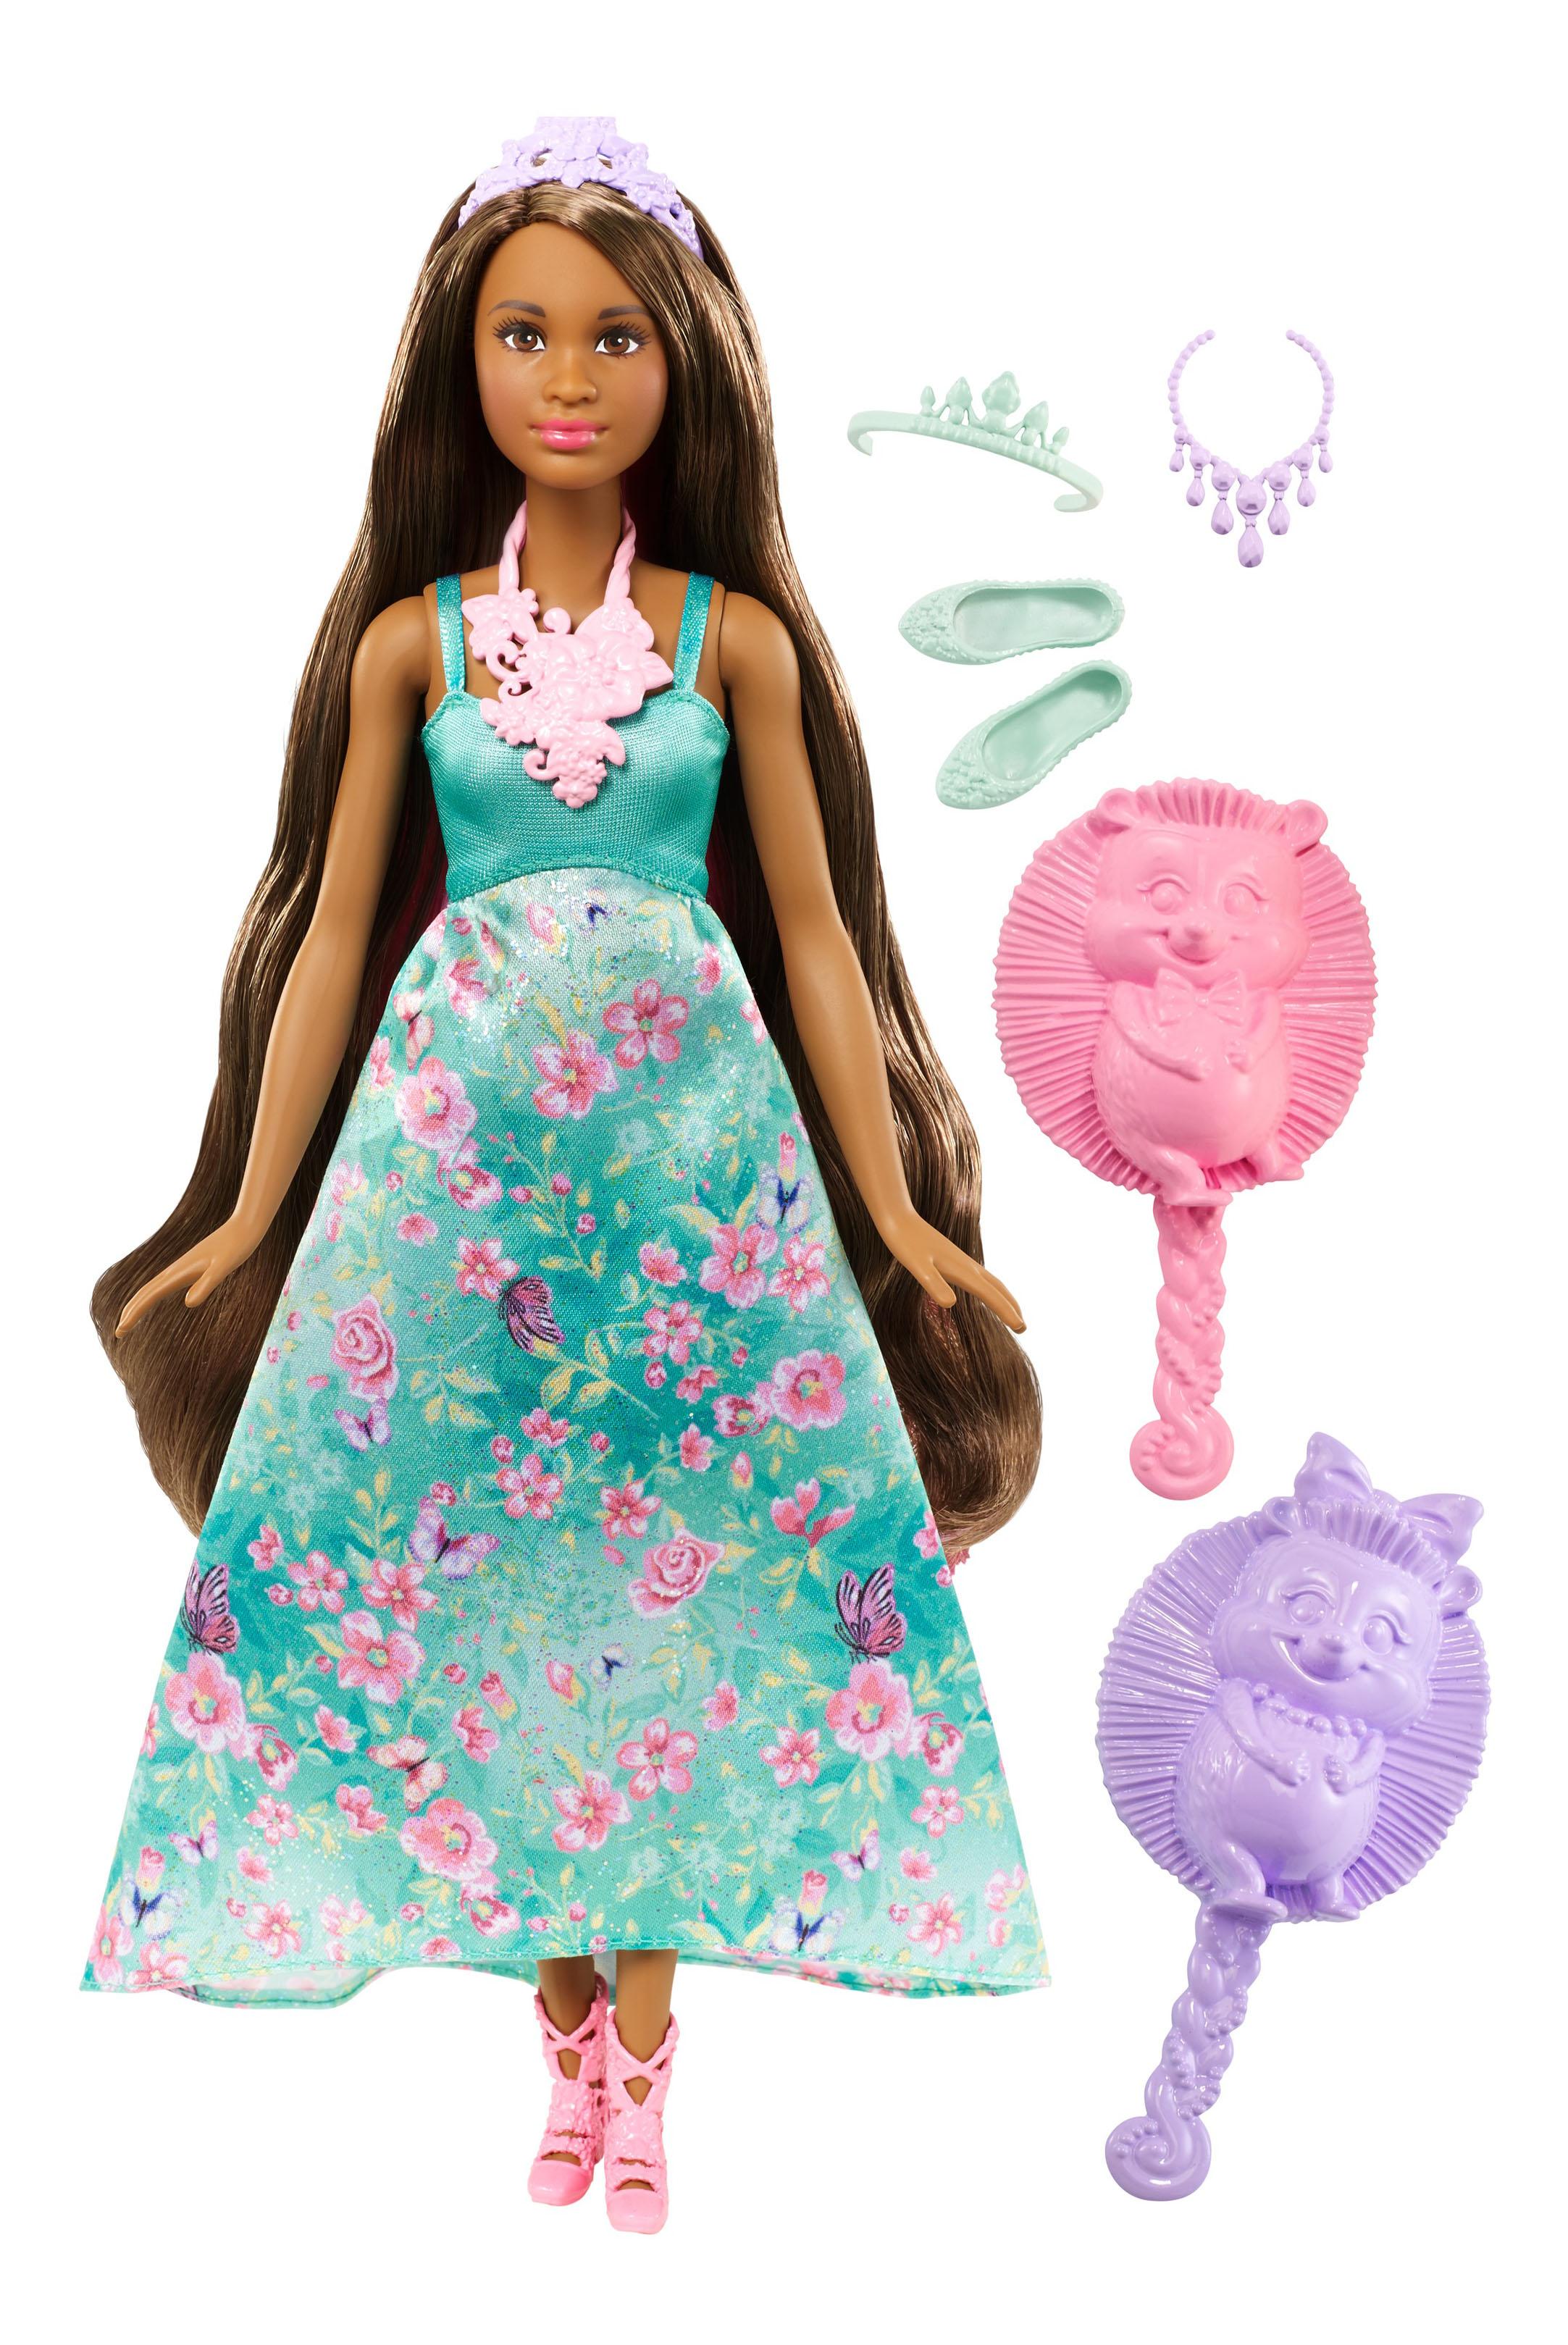 Купить Кукла Barbie Принцесса с волшебными волосами DWH41 DWH43, Куклы Barbie